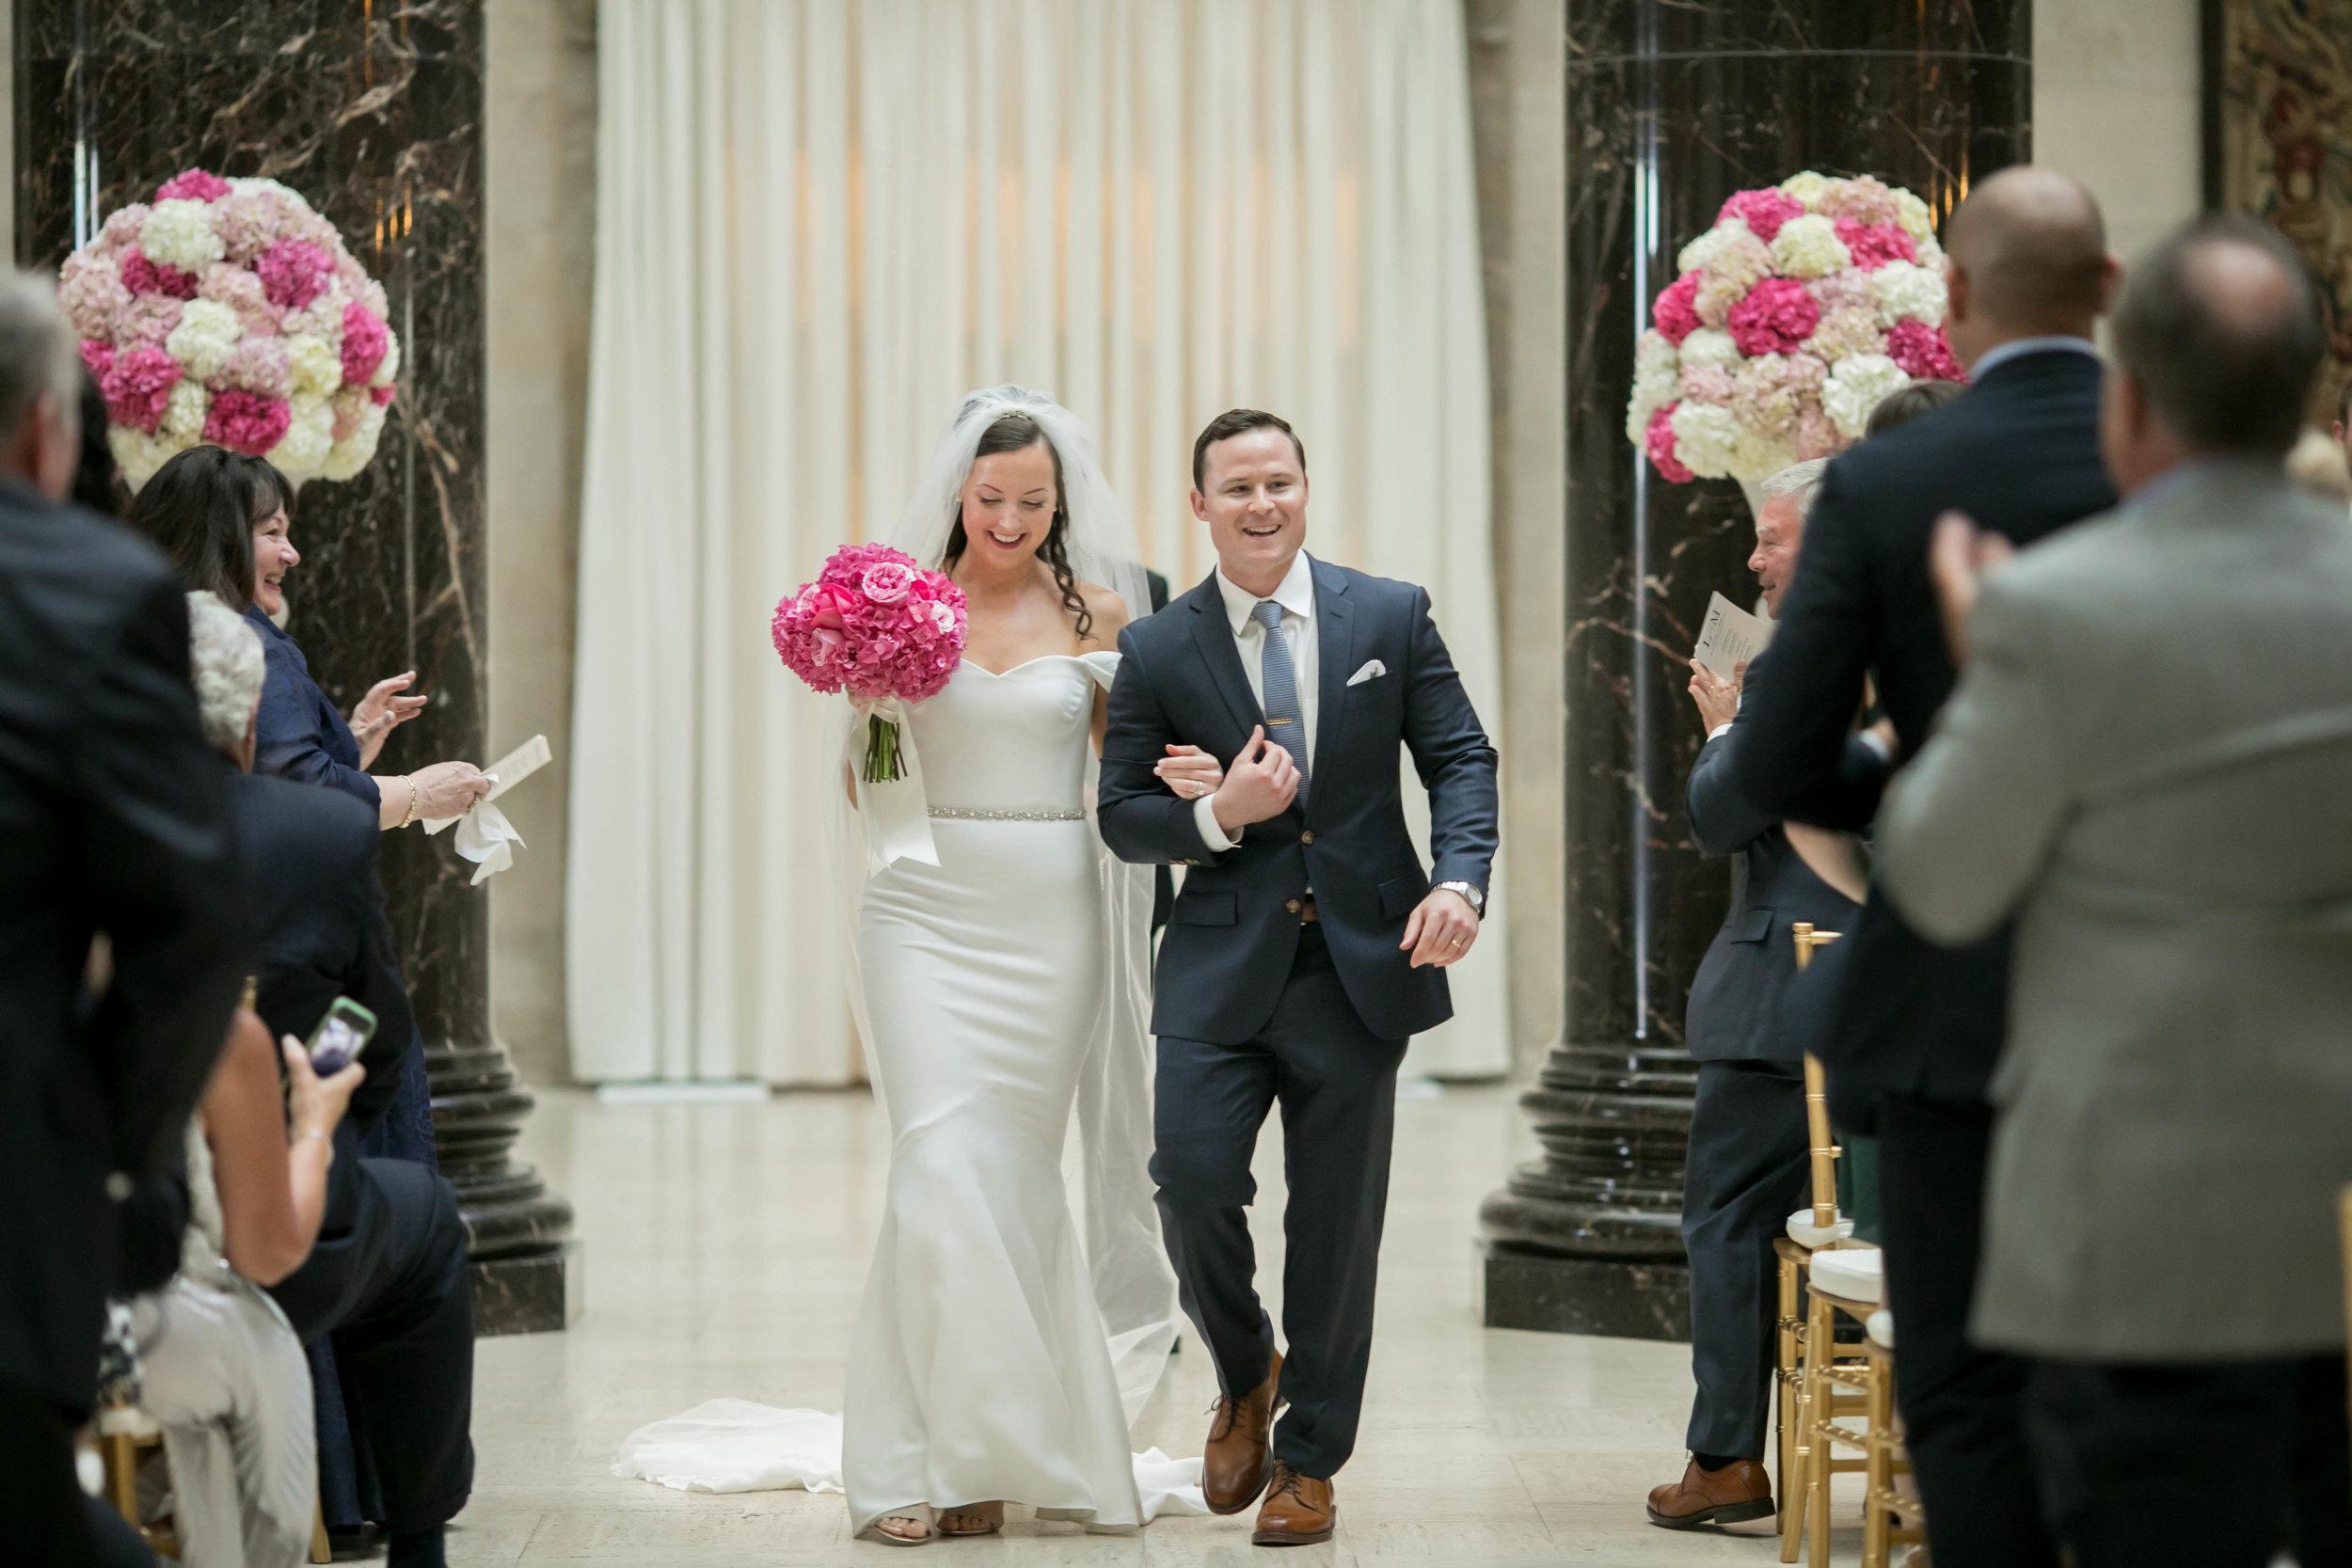 nelson-atkins-wedding-44.jpg